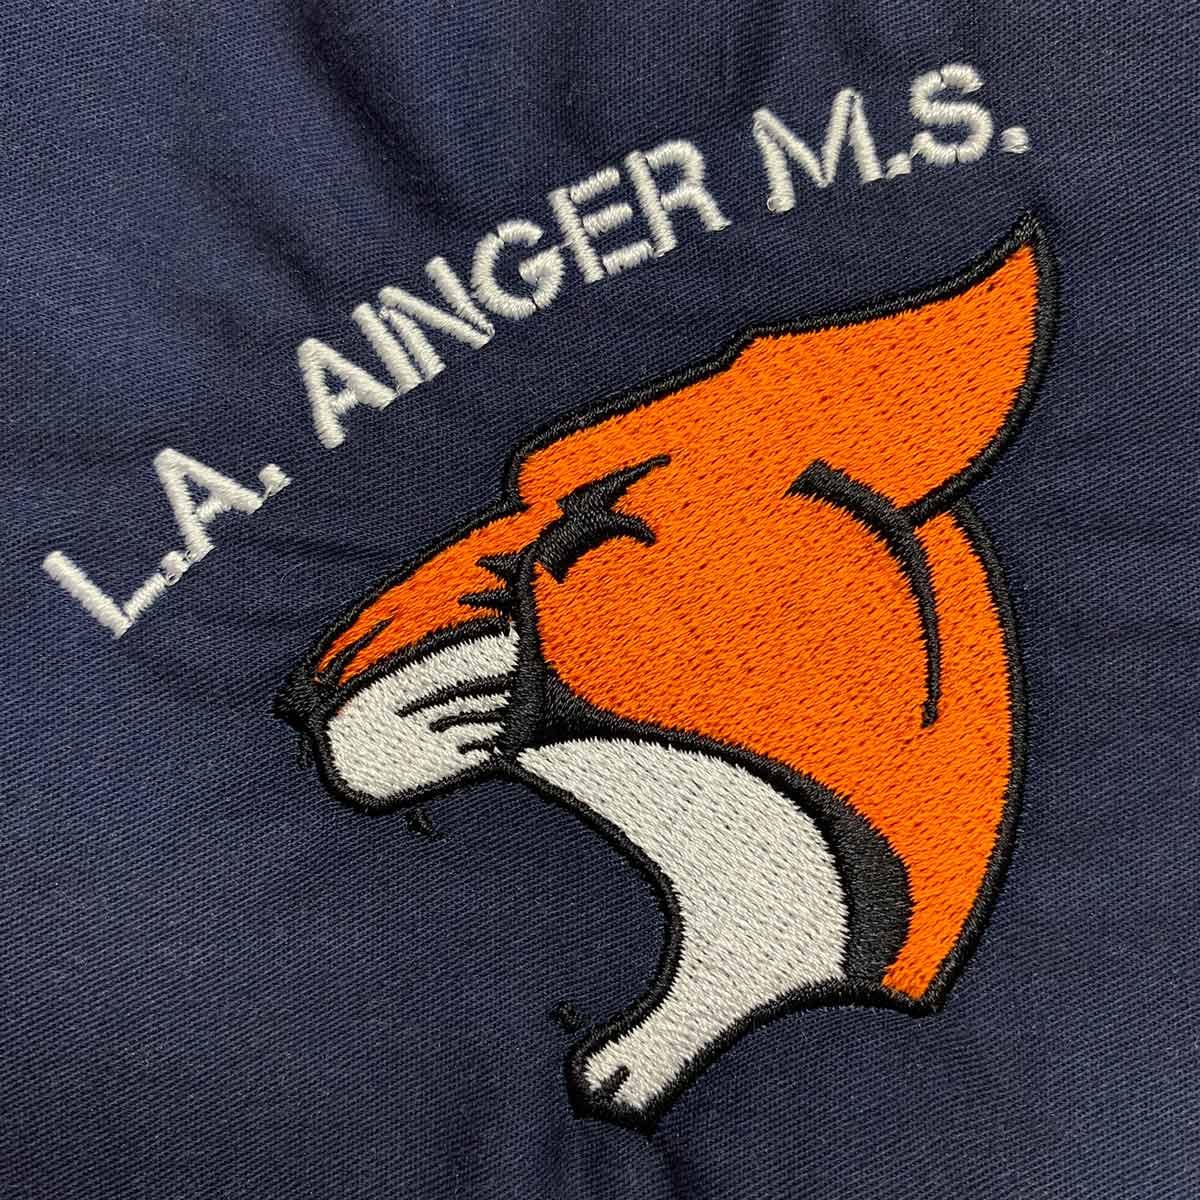 KYC_LA-AINGER-MIDDLE-SCHOOL-COUGARS_web.jpg